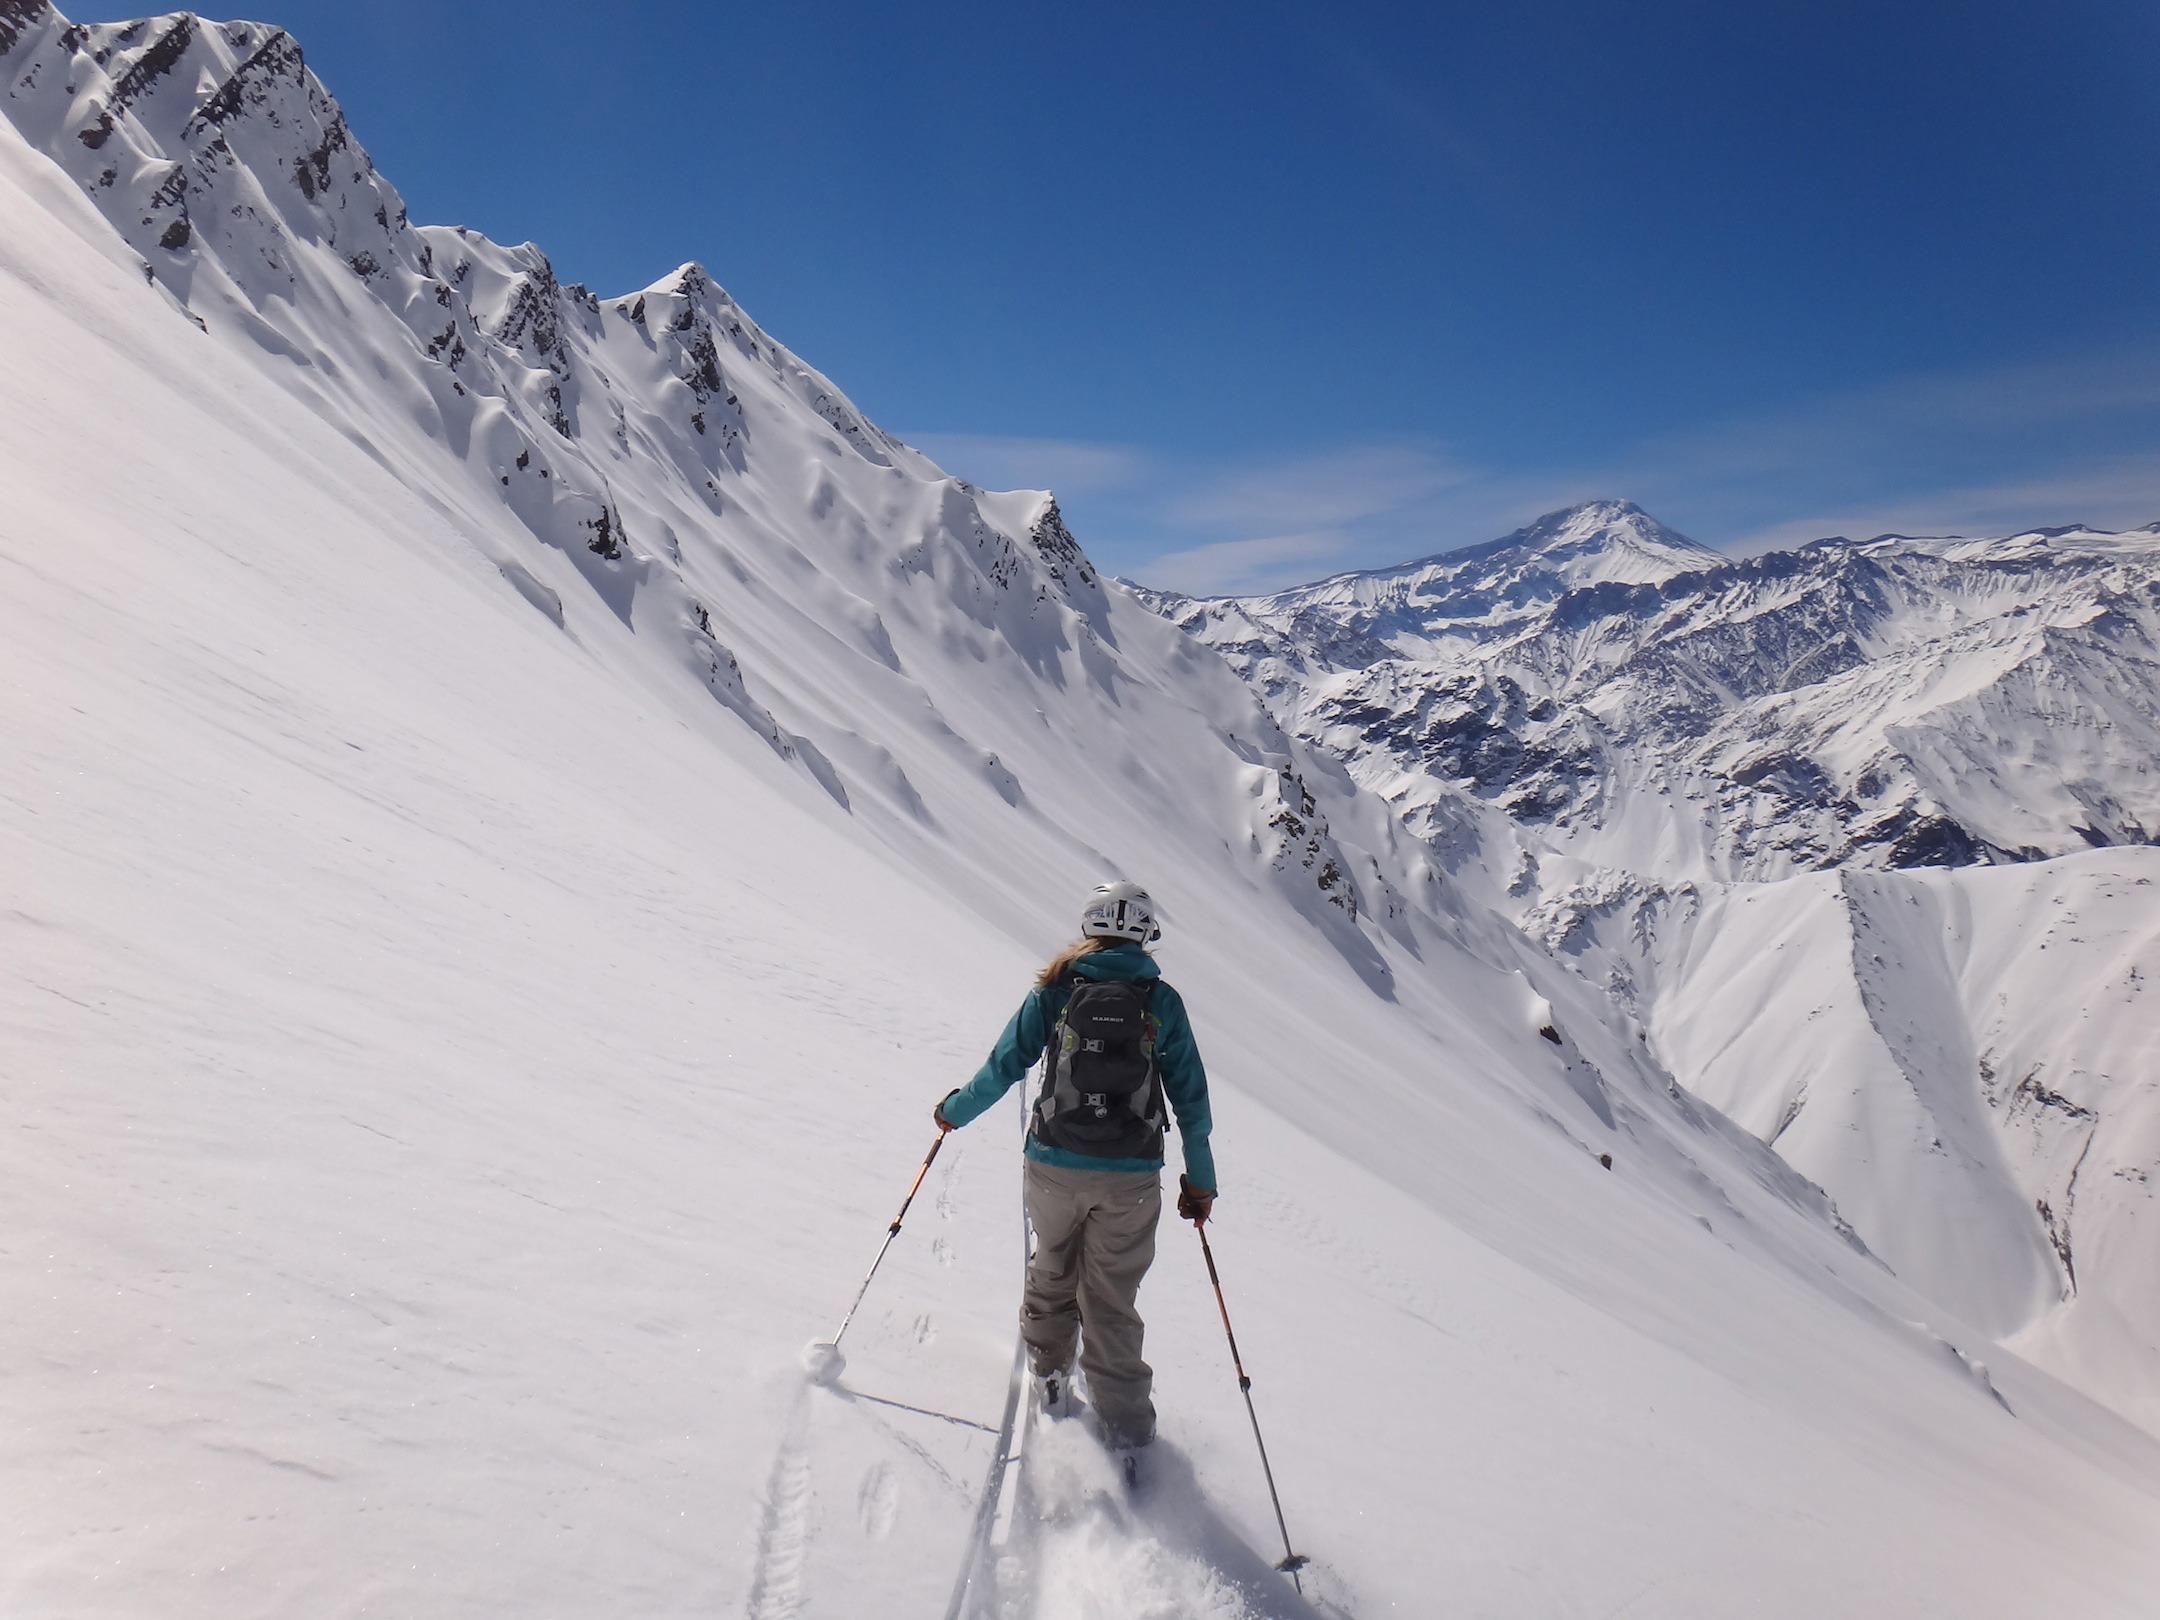 Valle Nevado Heliskiing